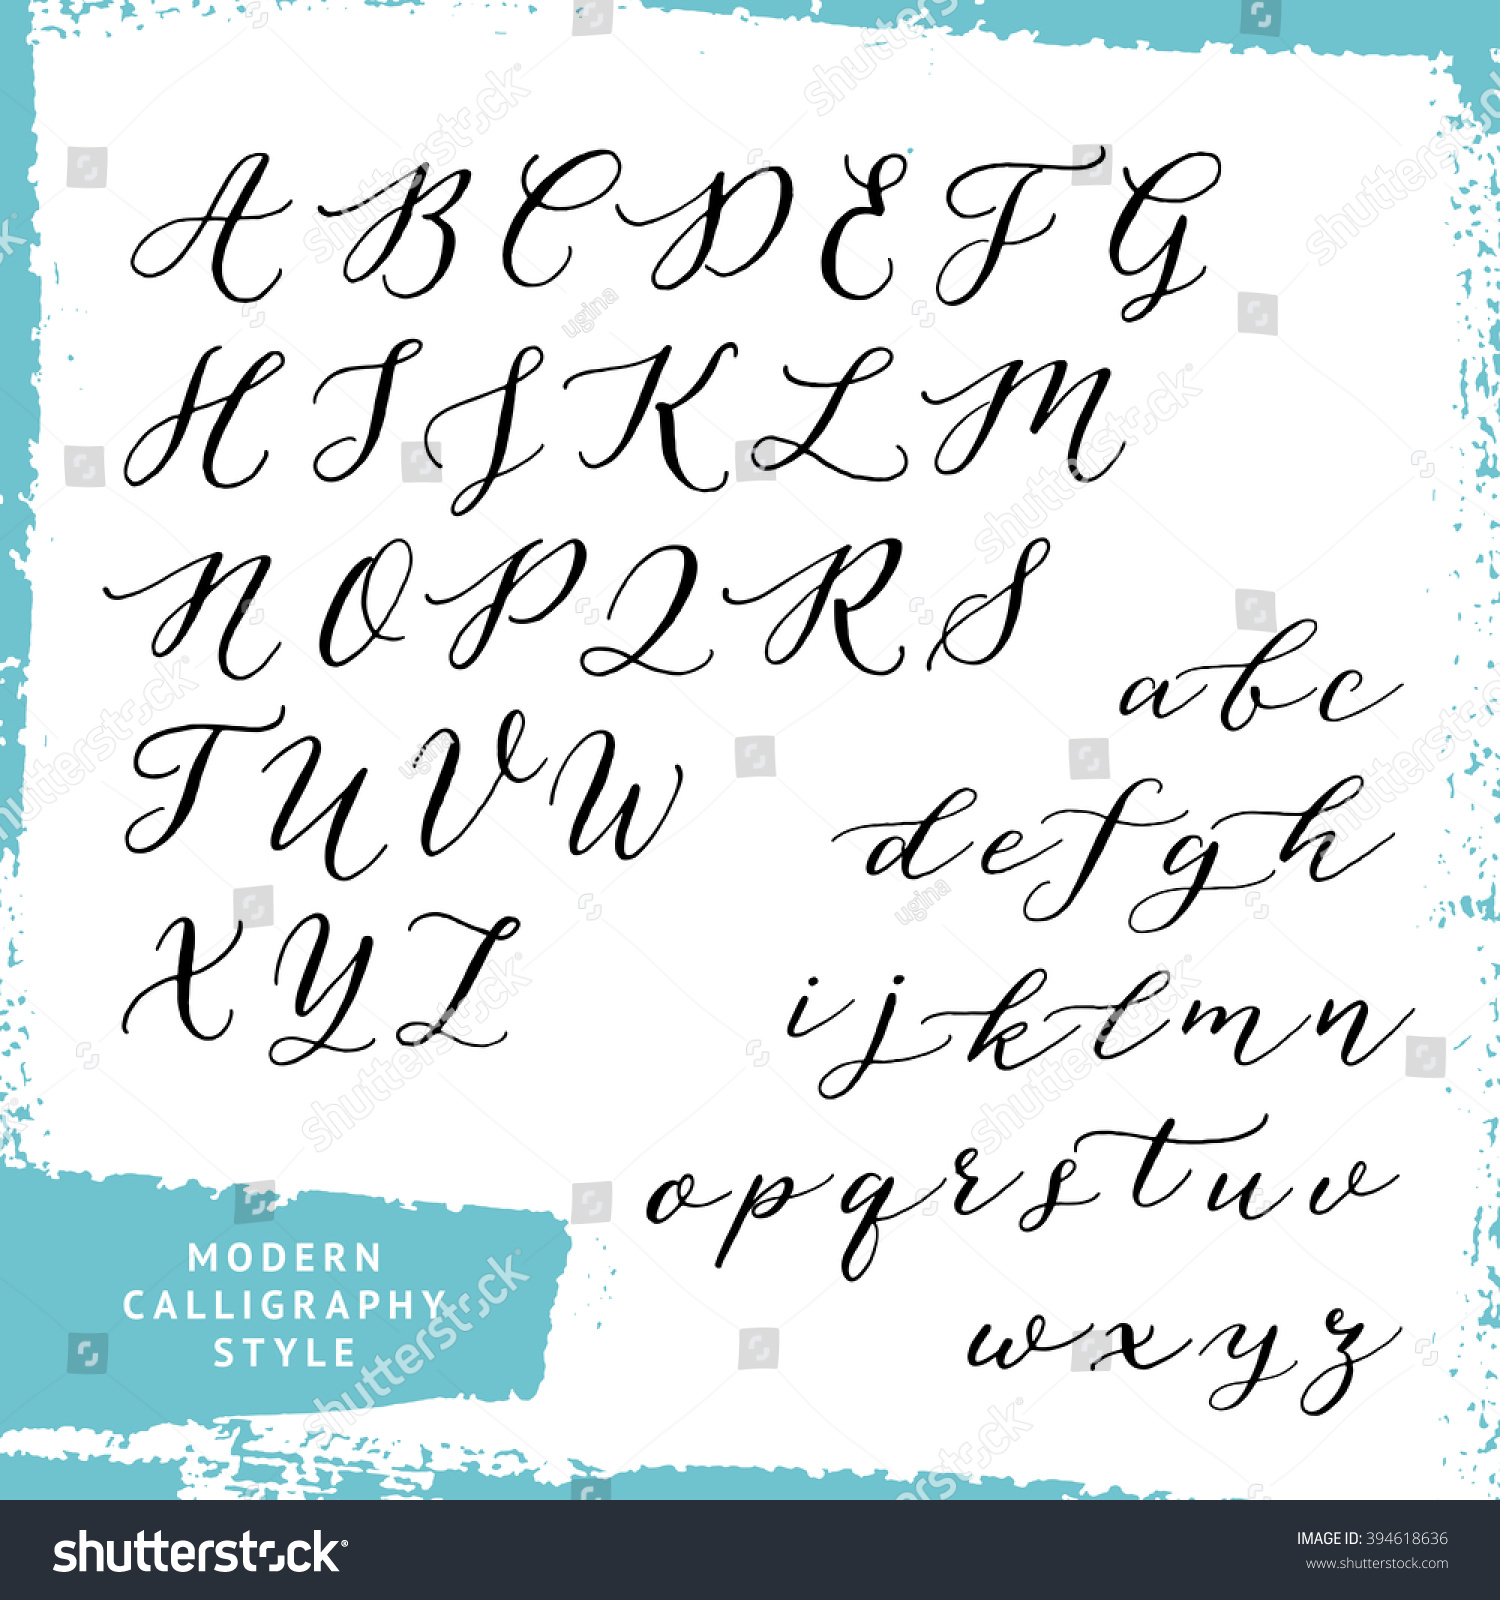 Modern Calligraphy Style Handwritten Script Alphabet Stock Vector